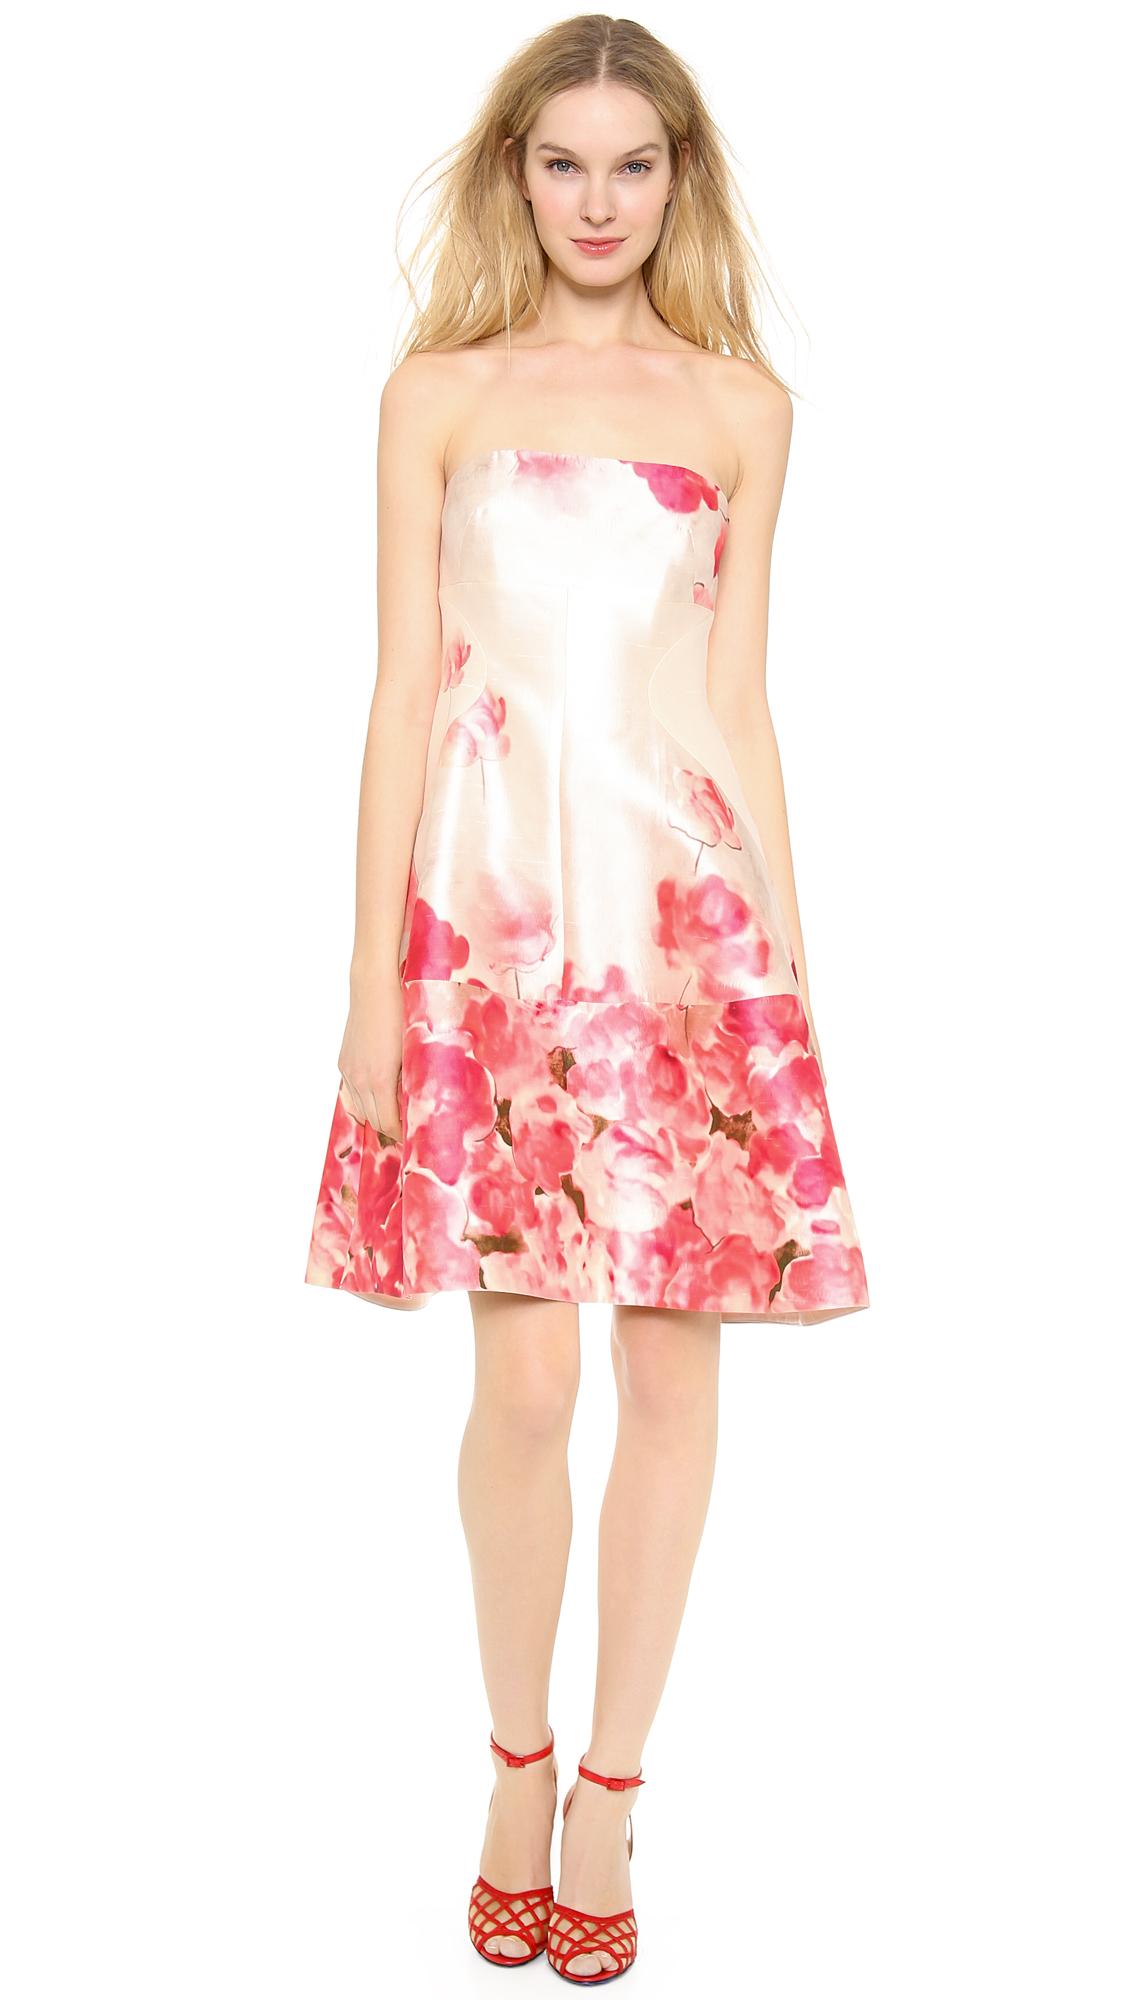 591bcef5e590 Lela Rose Seamed Strapless Dress in Pink - Lyst